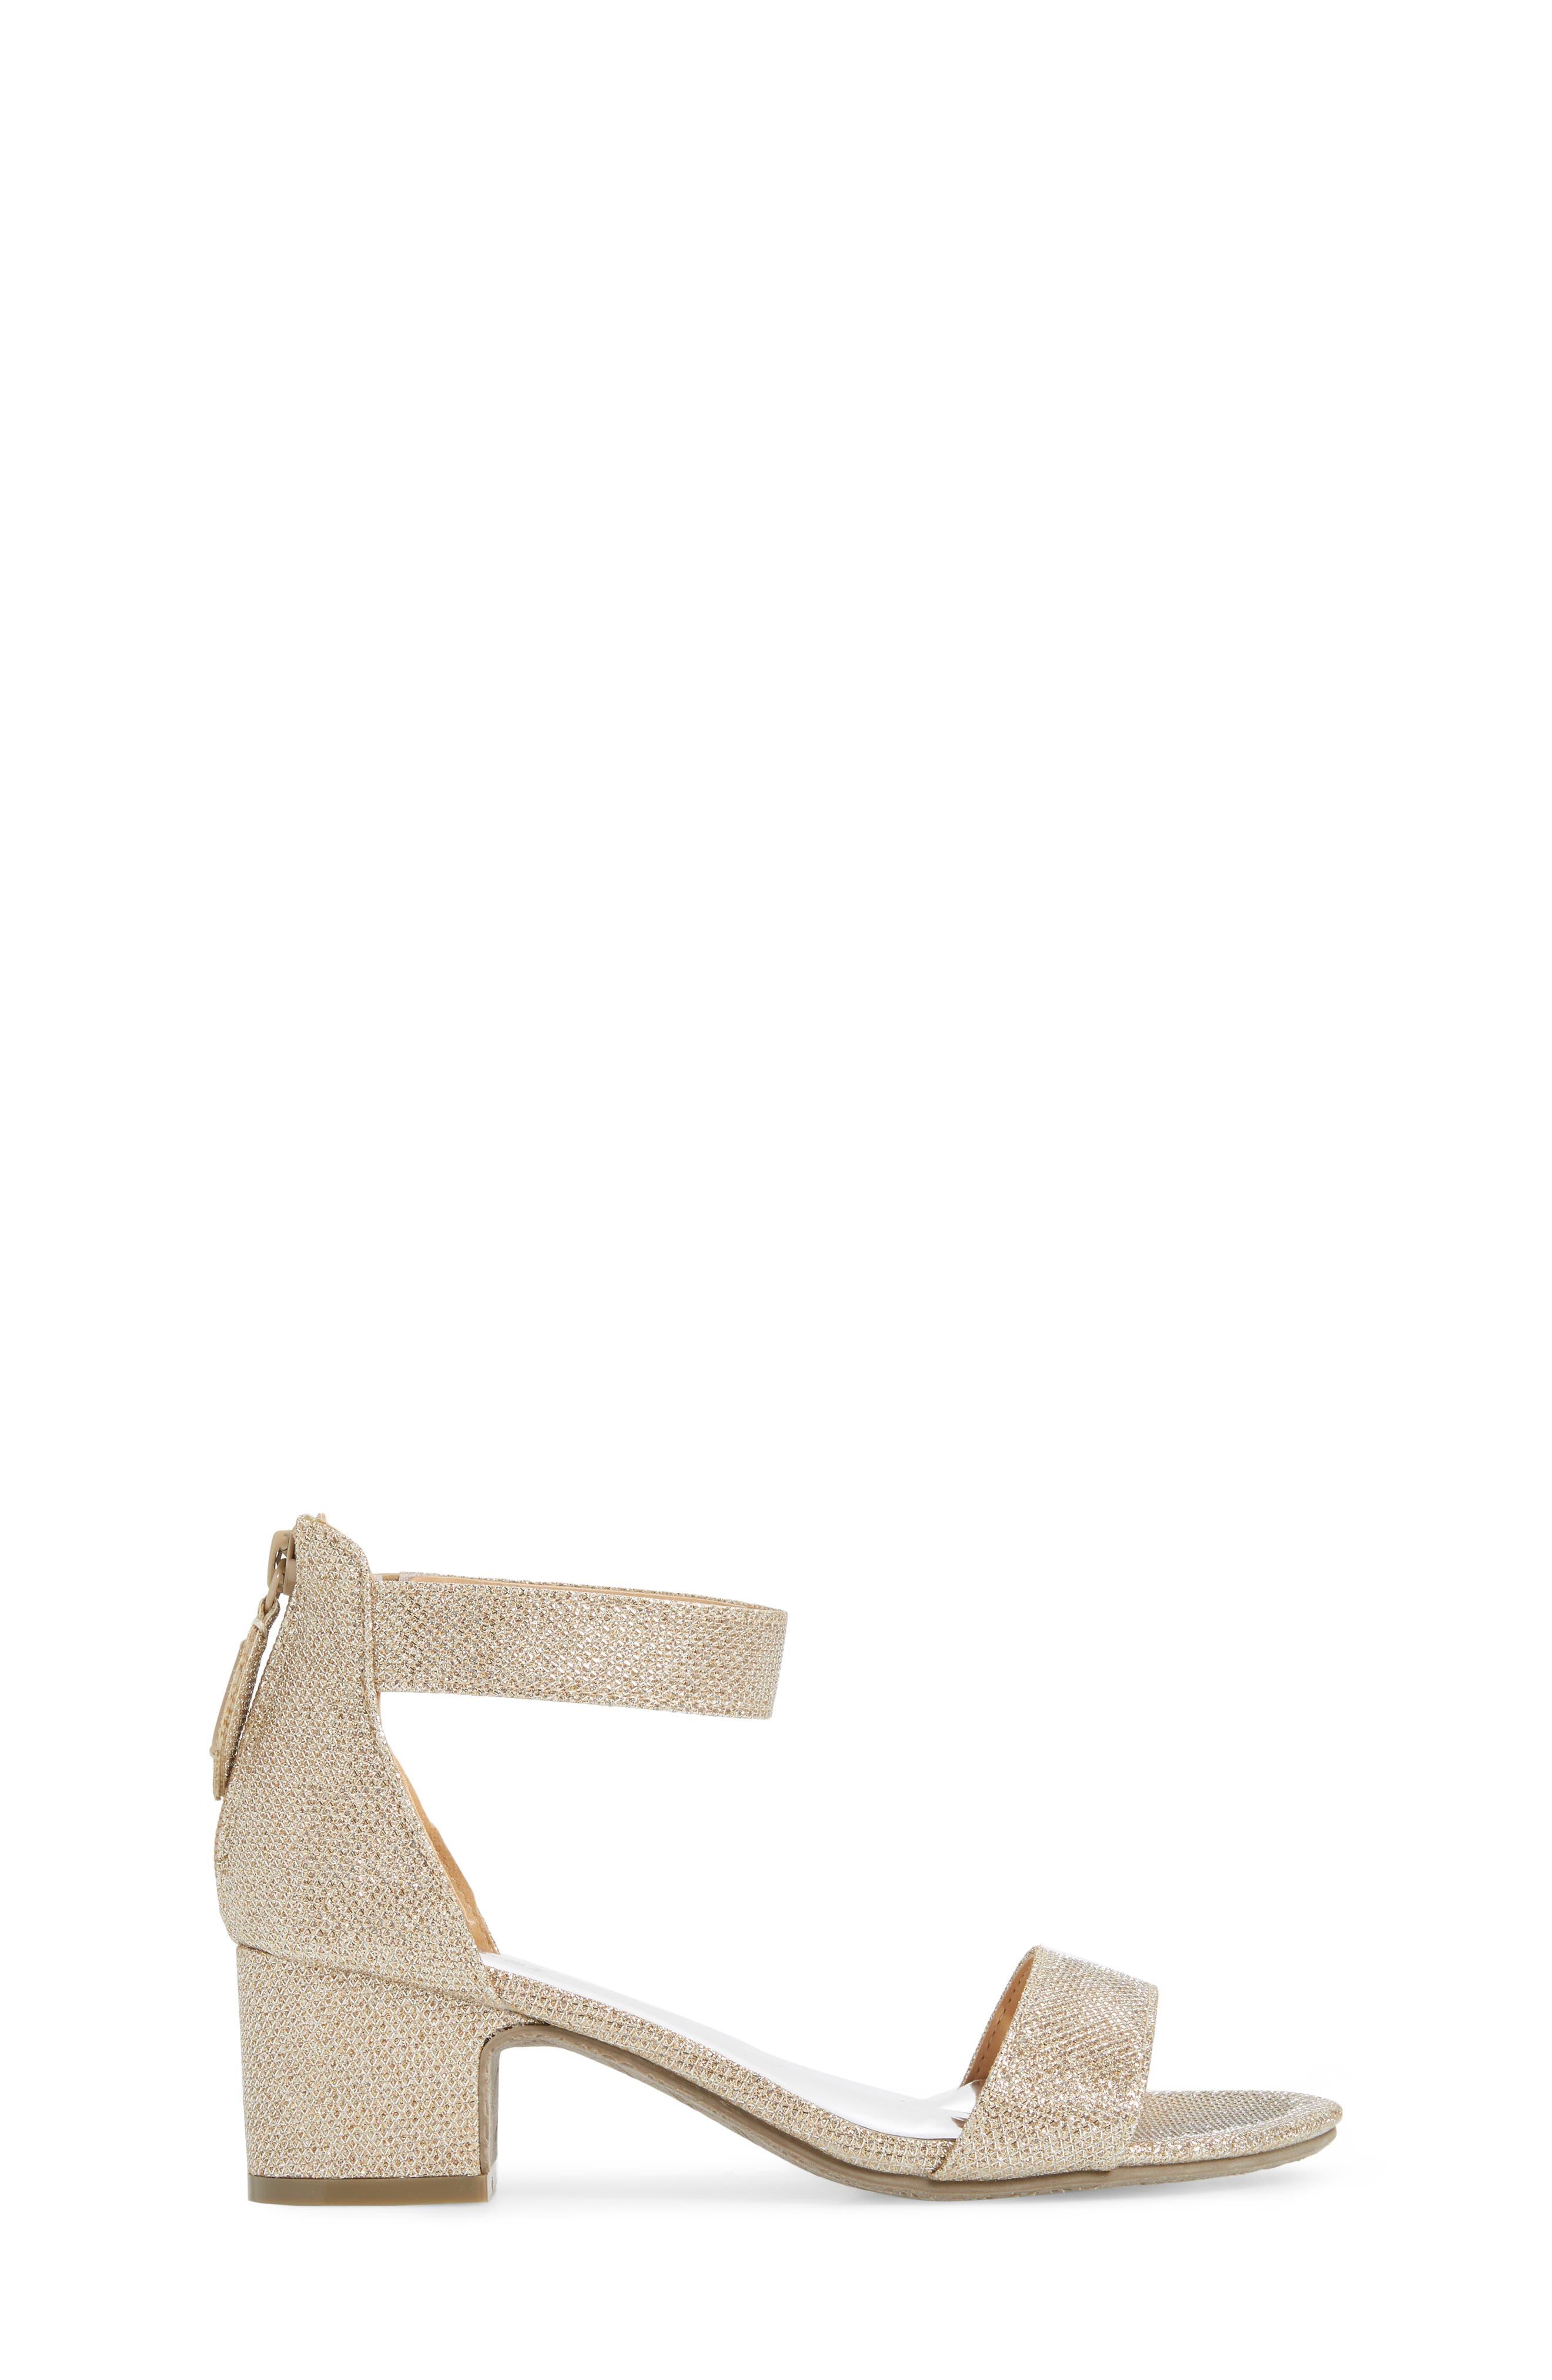 BADGLEY MISCHKA COLLECTION, Badgley Mischka Pernia Velma Shimmer Sandal, Alternate thumbnail 3, color, LIGHT GOLD SHIMMER